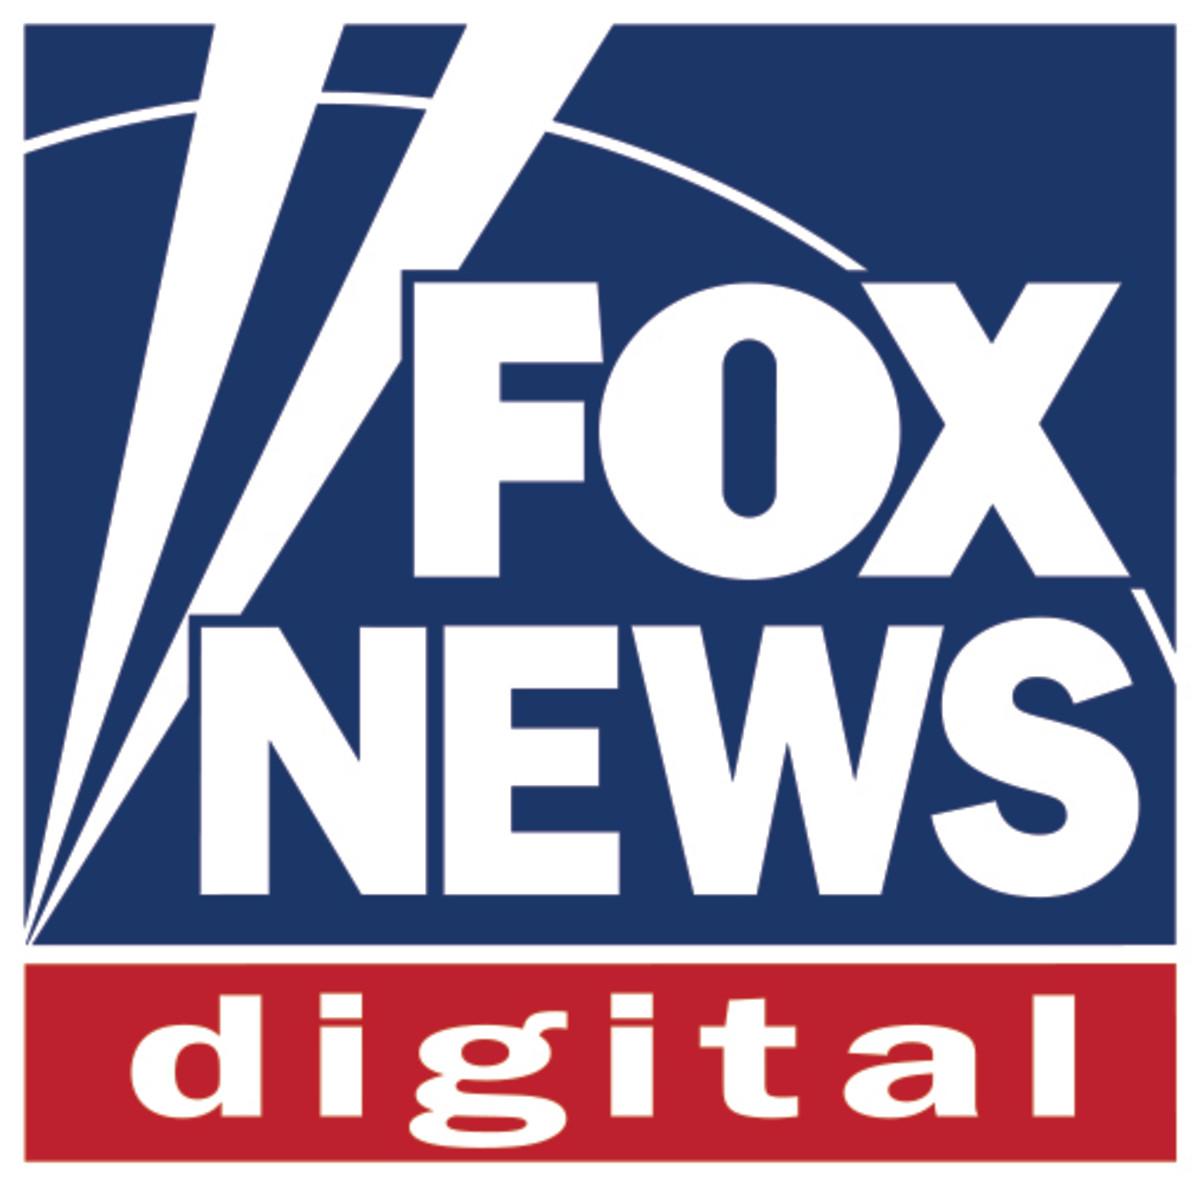 Fox News Names Berry Editor.